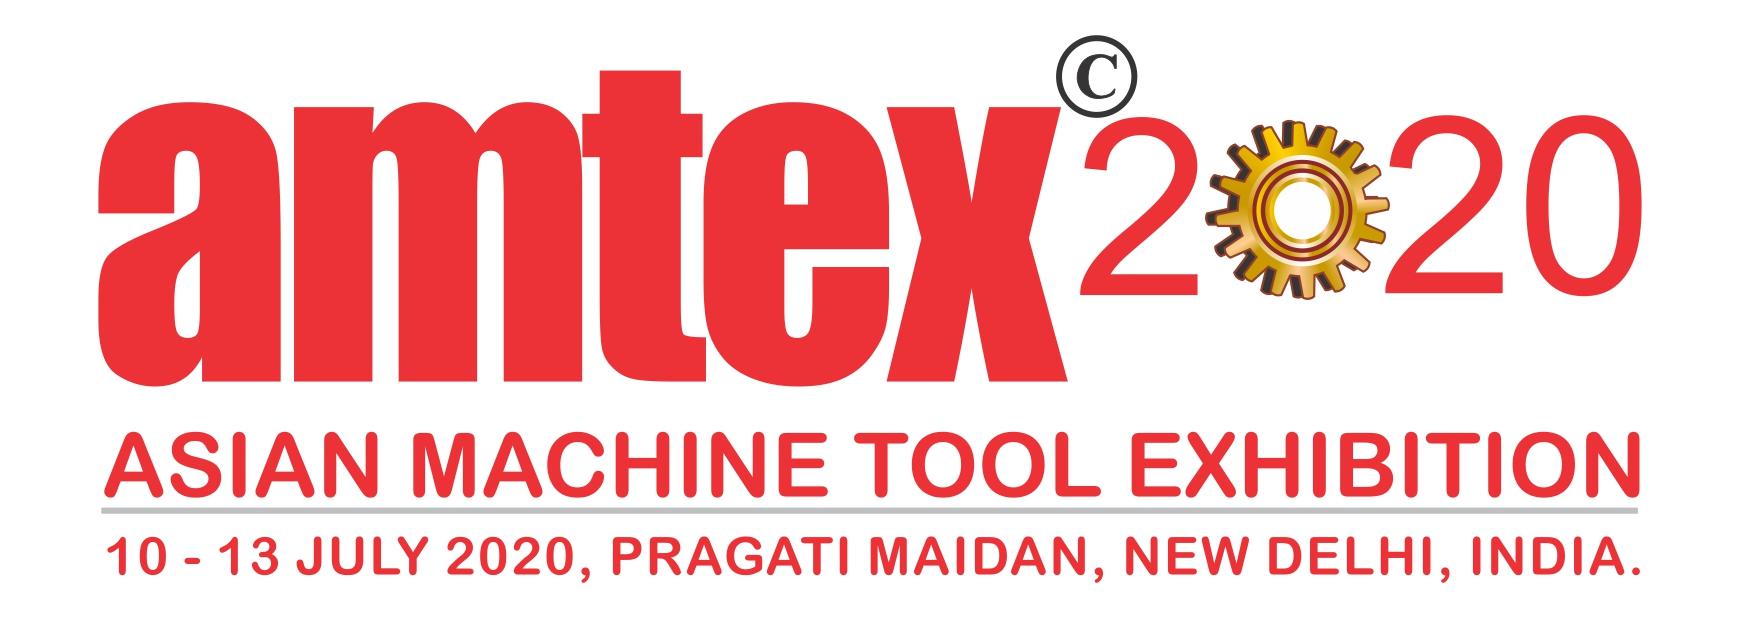 AMTEX 2020 - INDIA'S METAL CUTTING & MACHINE TOOL EVENT